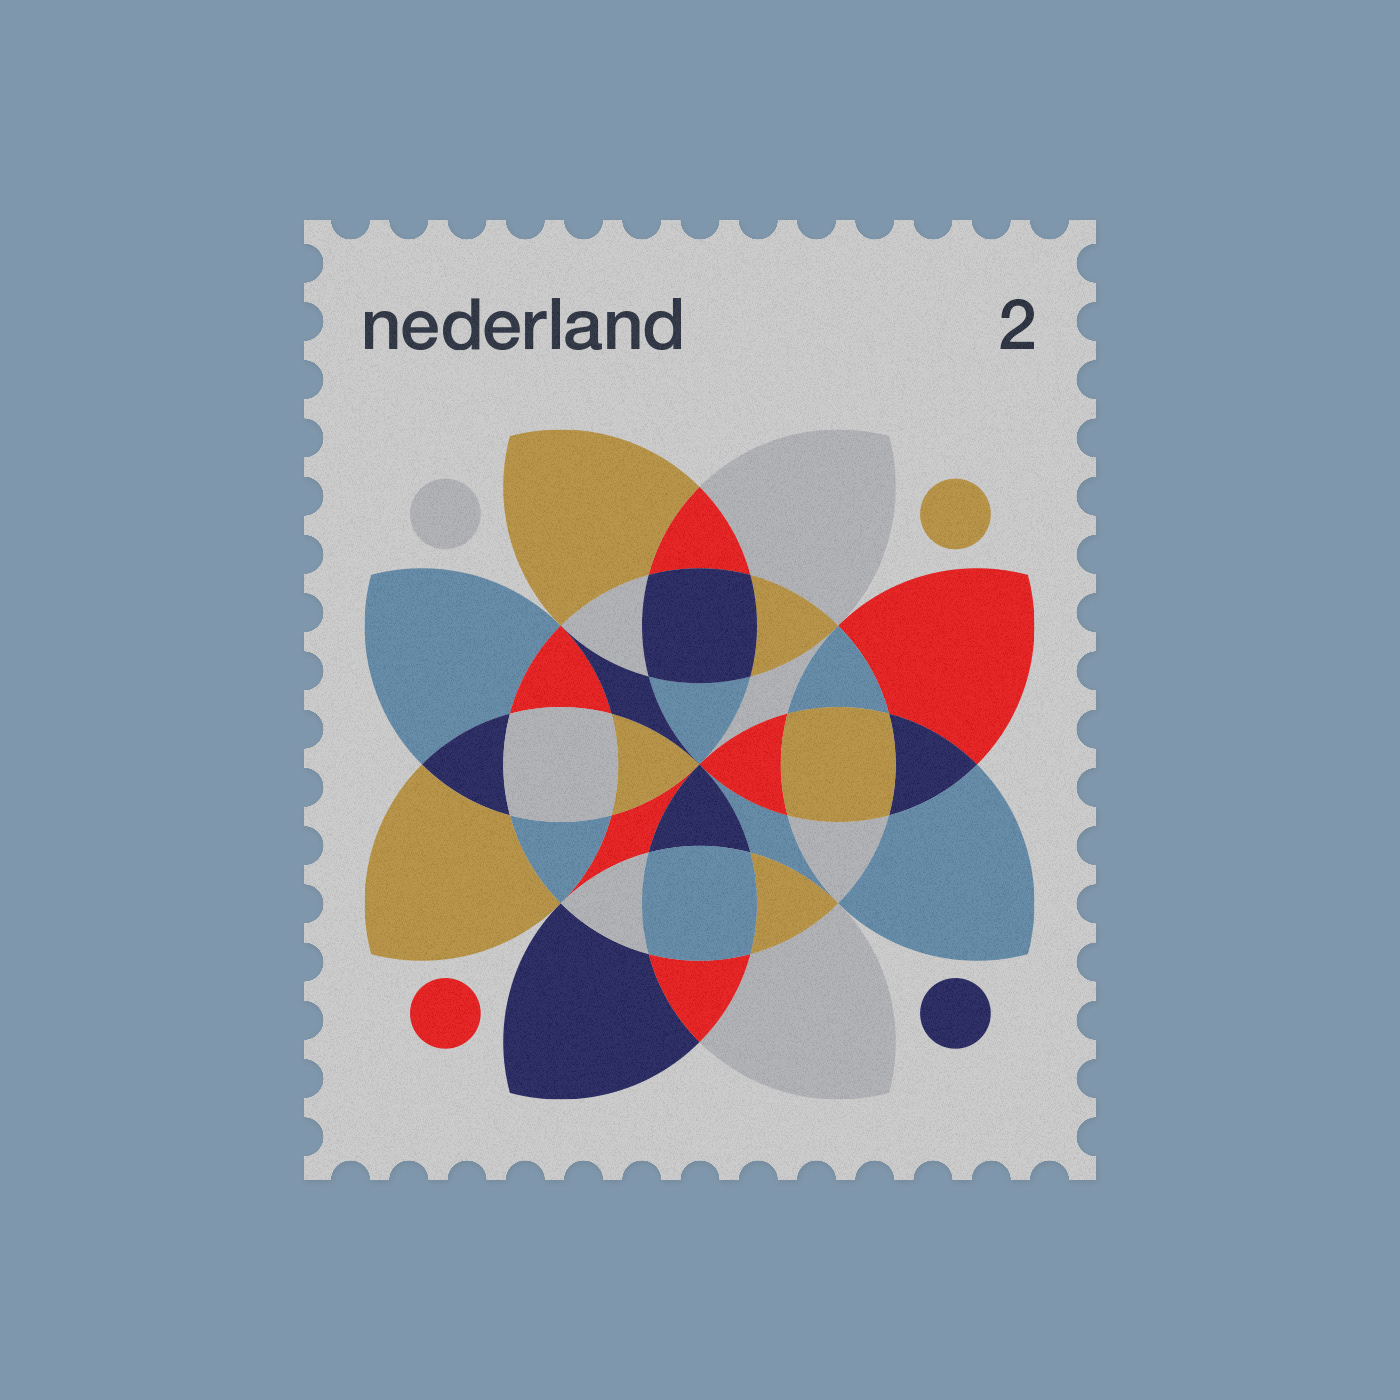 dutch geometric minimal netherland stamp stamps